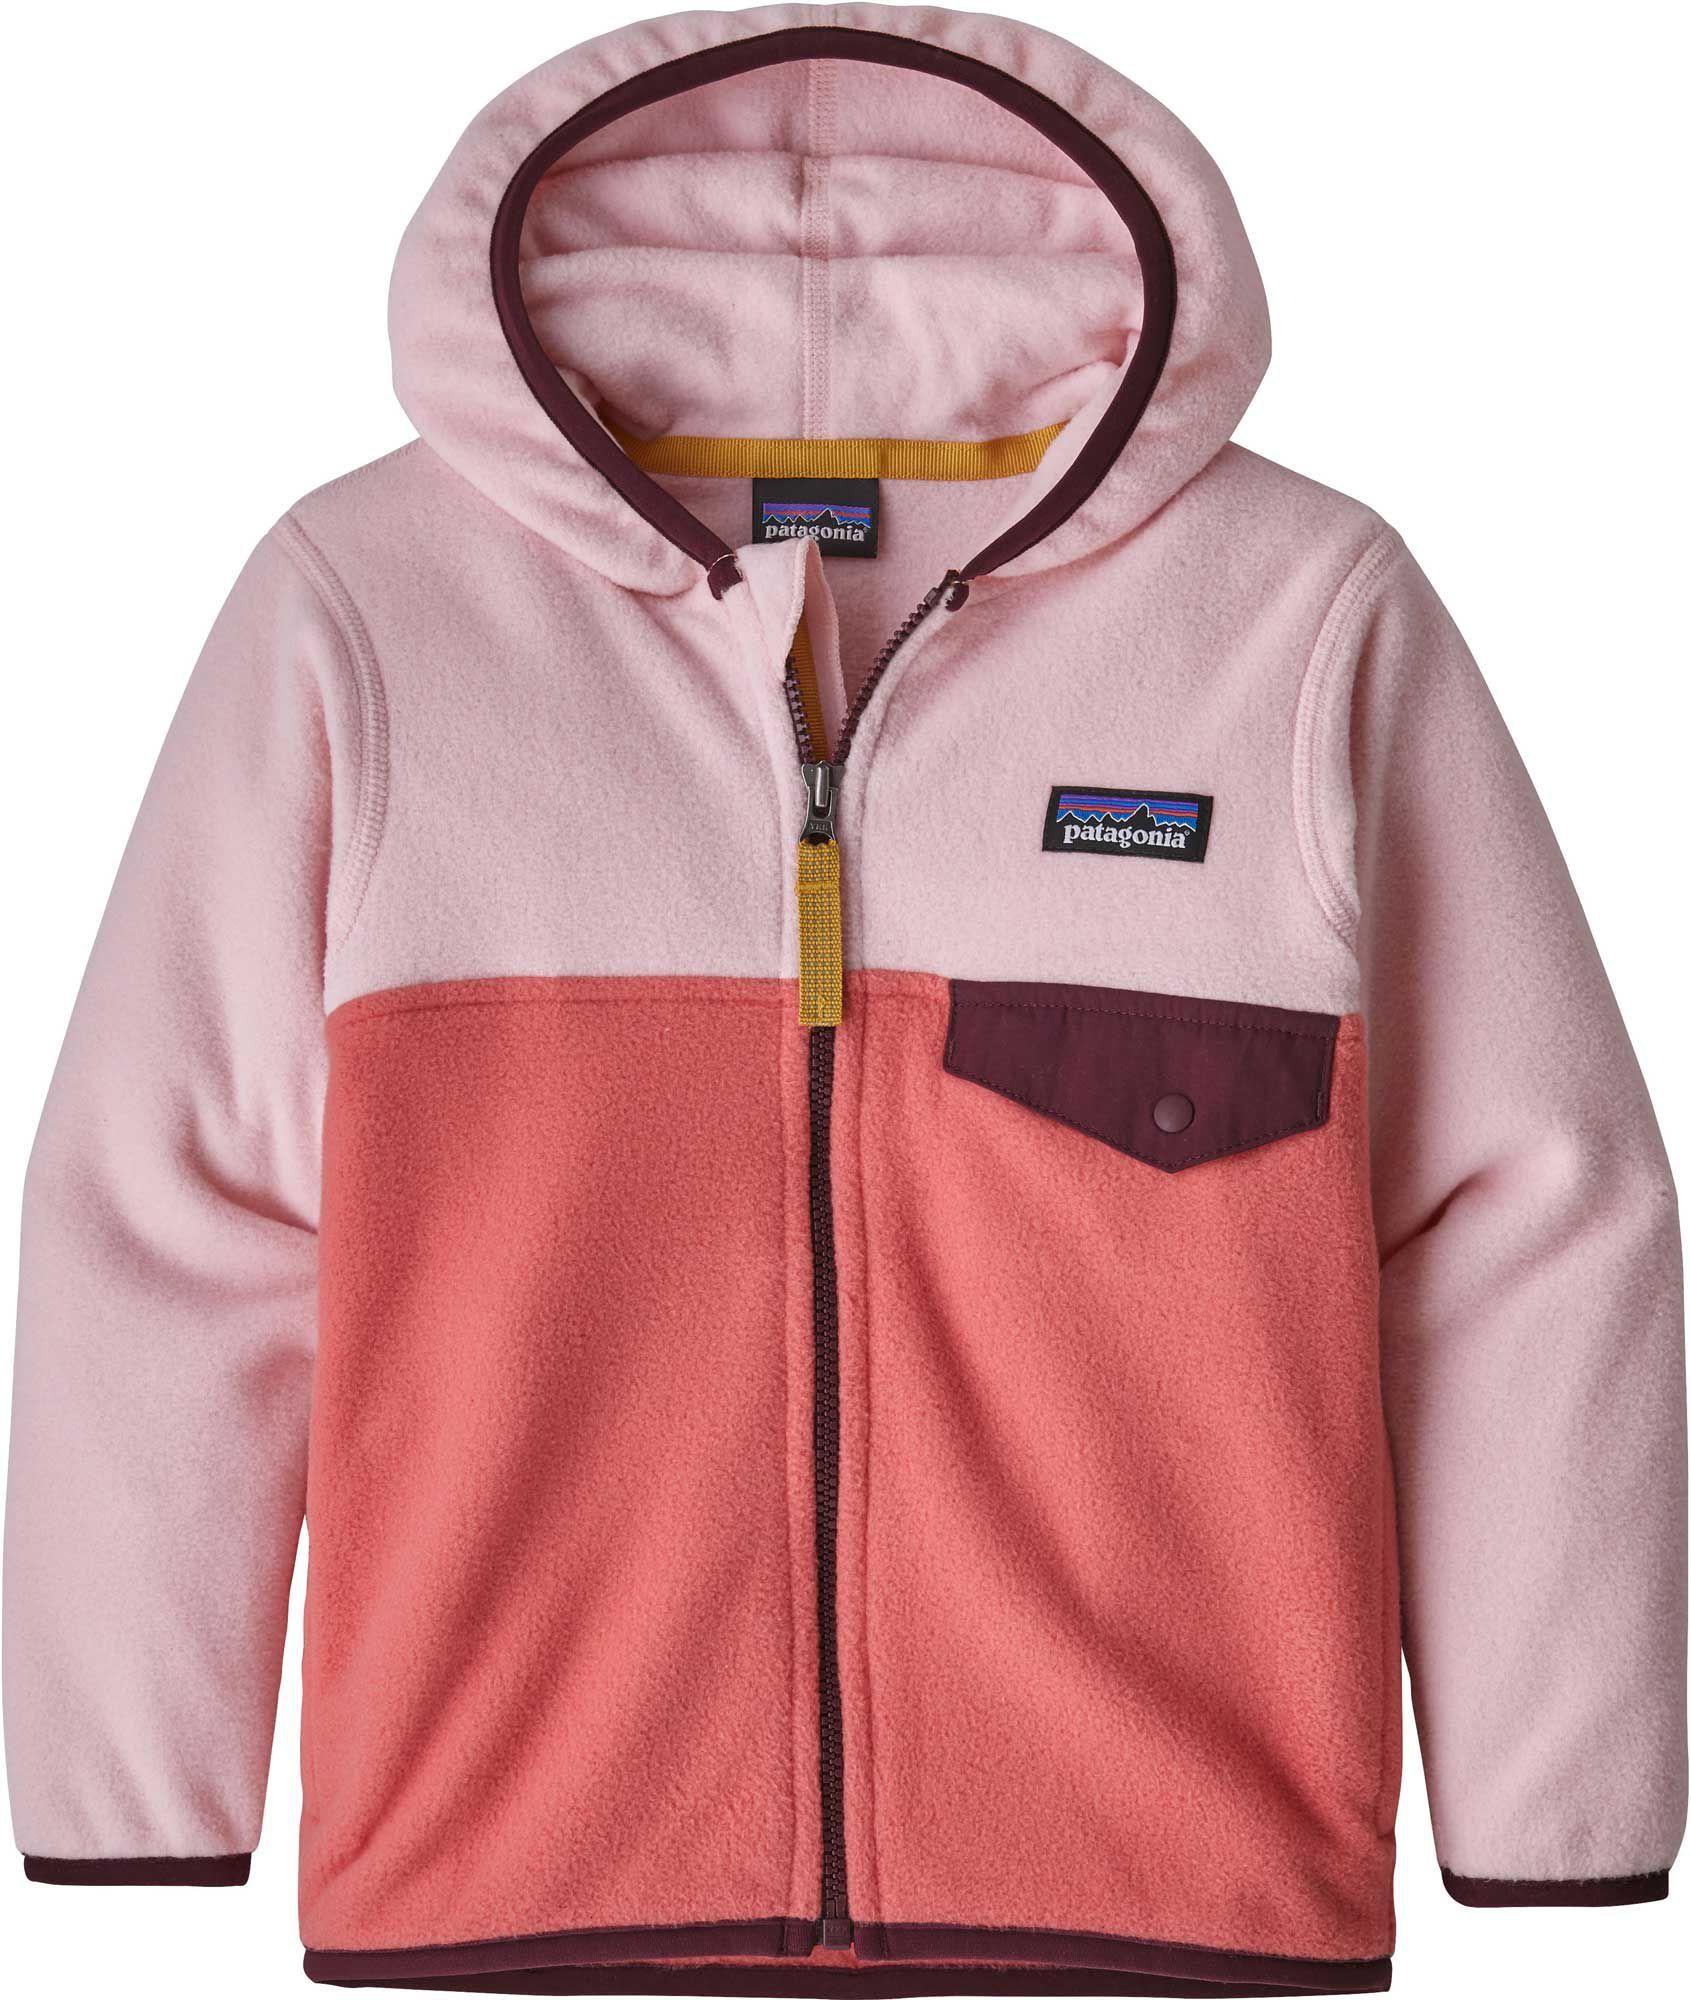 Patagonia Toddler Micro D SnapT Fleece Jacket, Size 2T